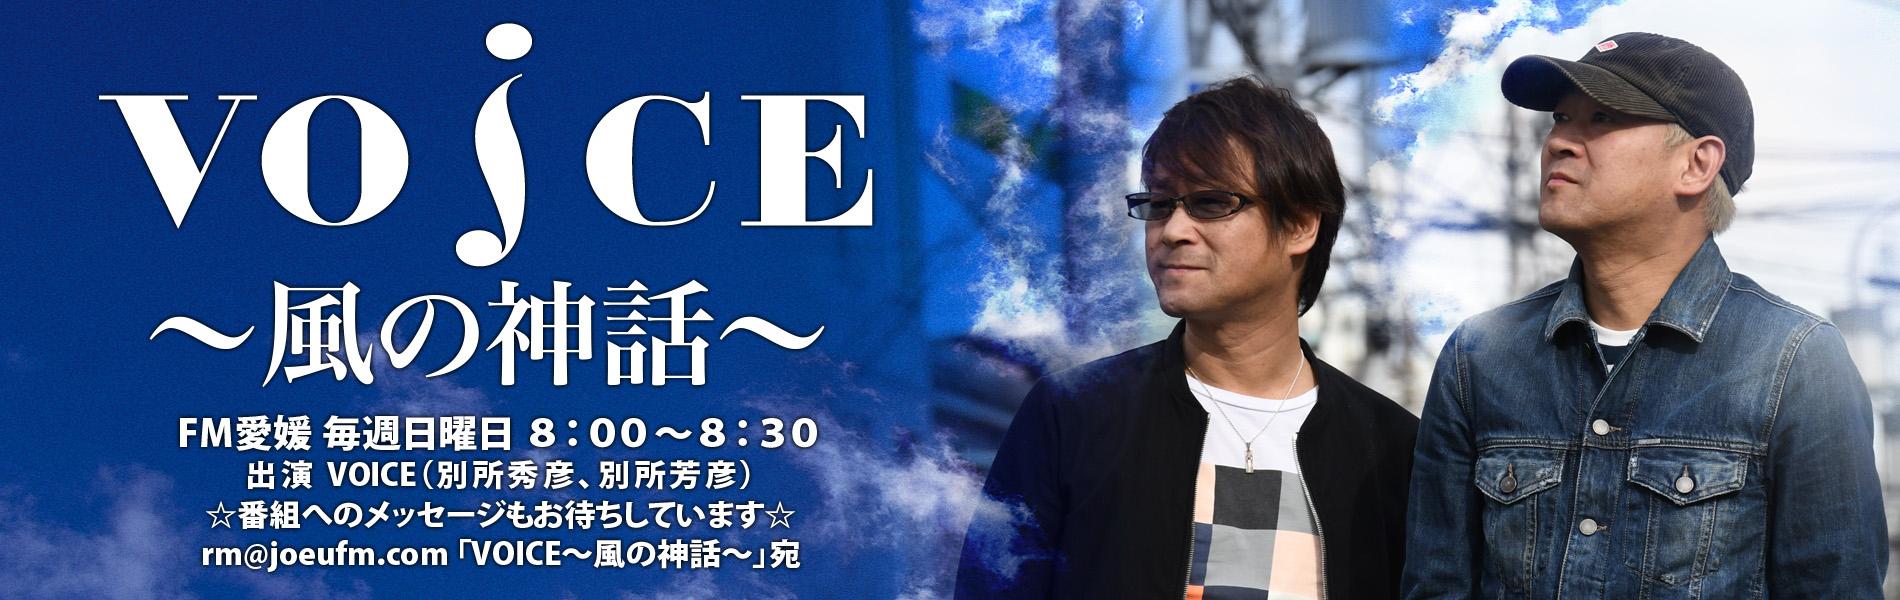 VOICE 〜風の神話〜